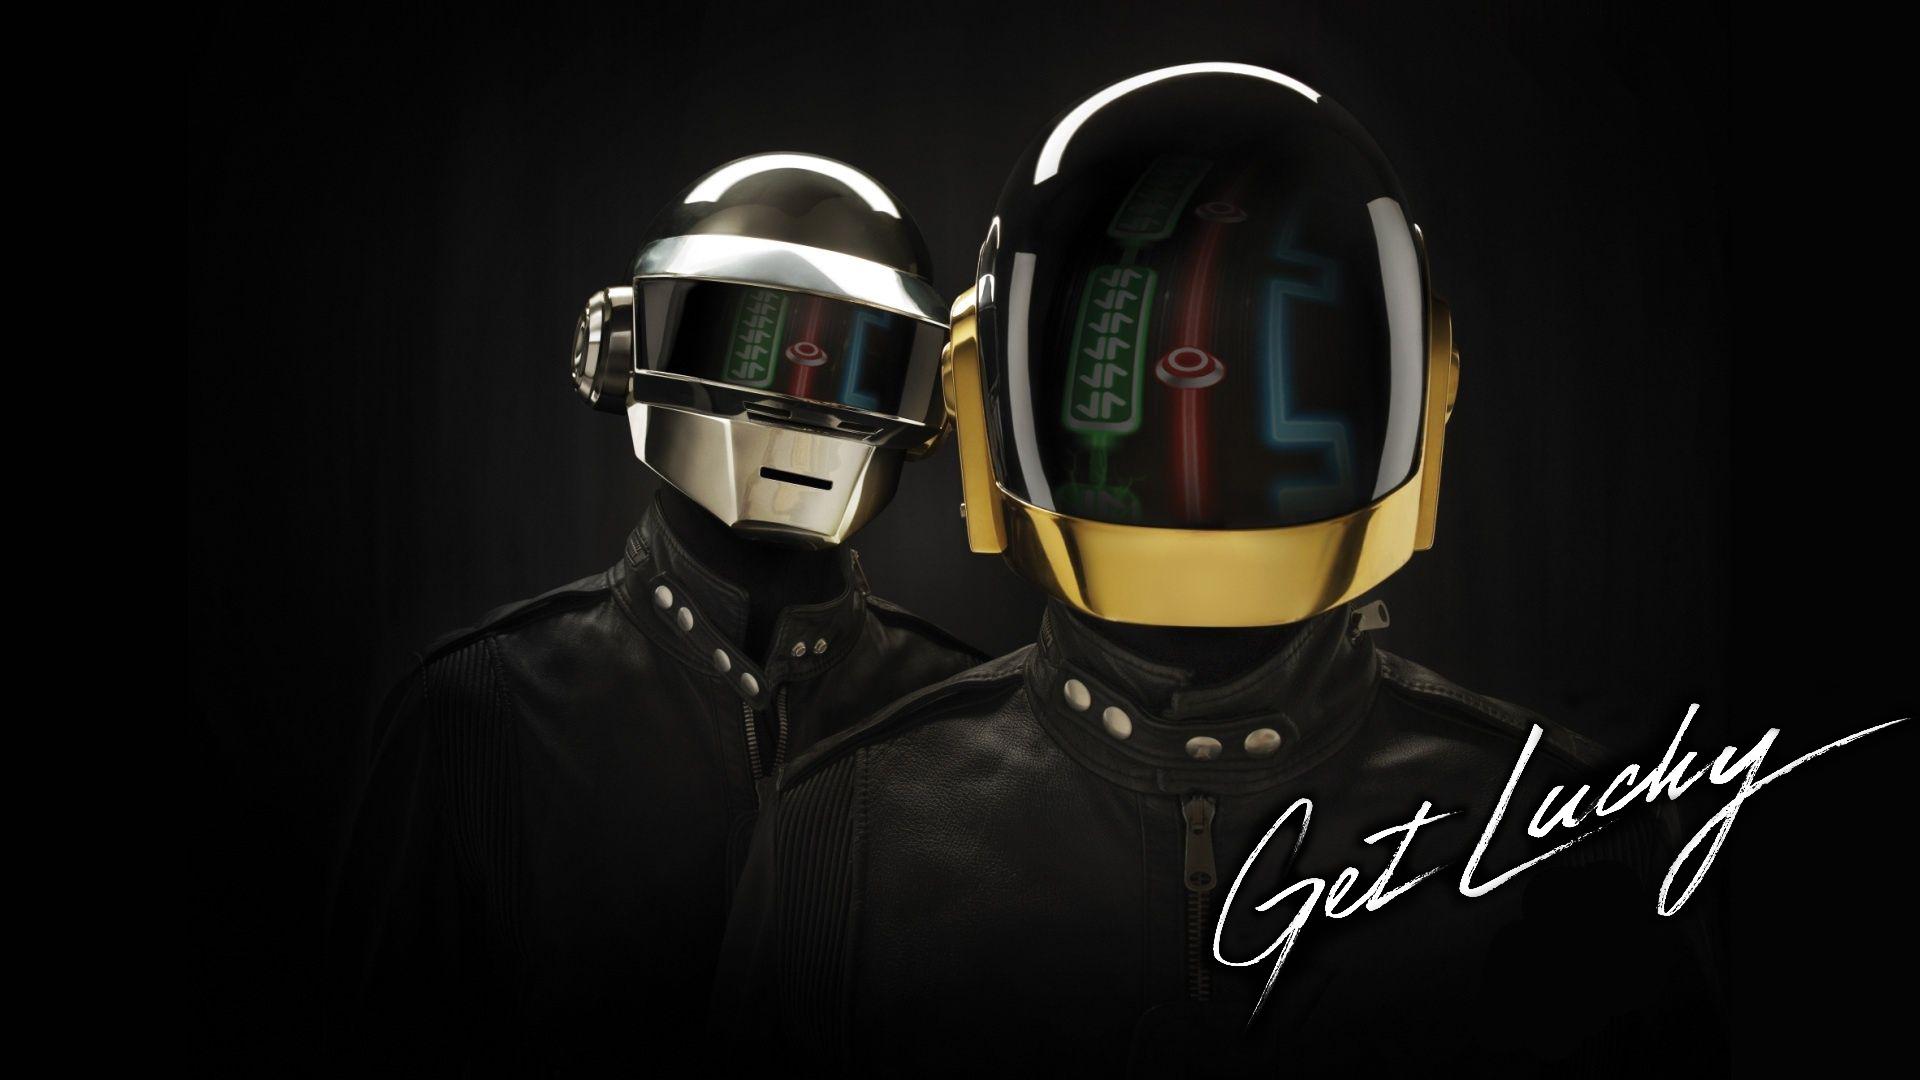 DAFT PUNK LYRICS - Get Lucky - A-Z Lyrics